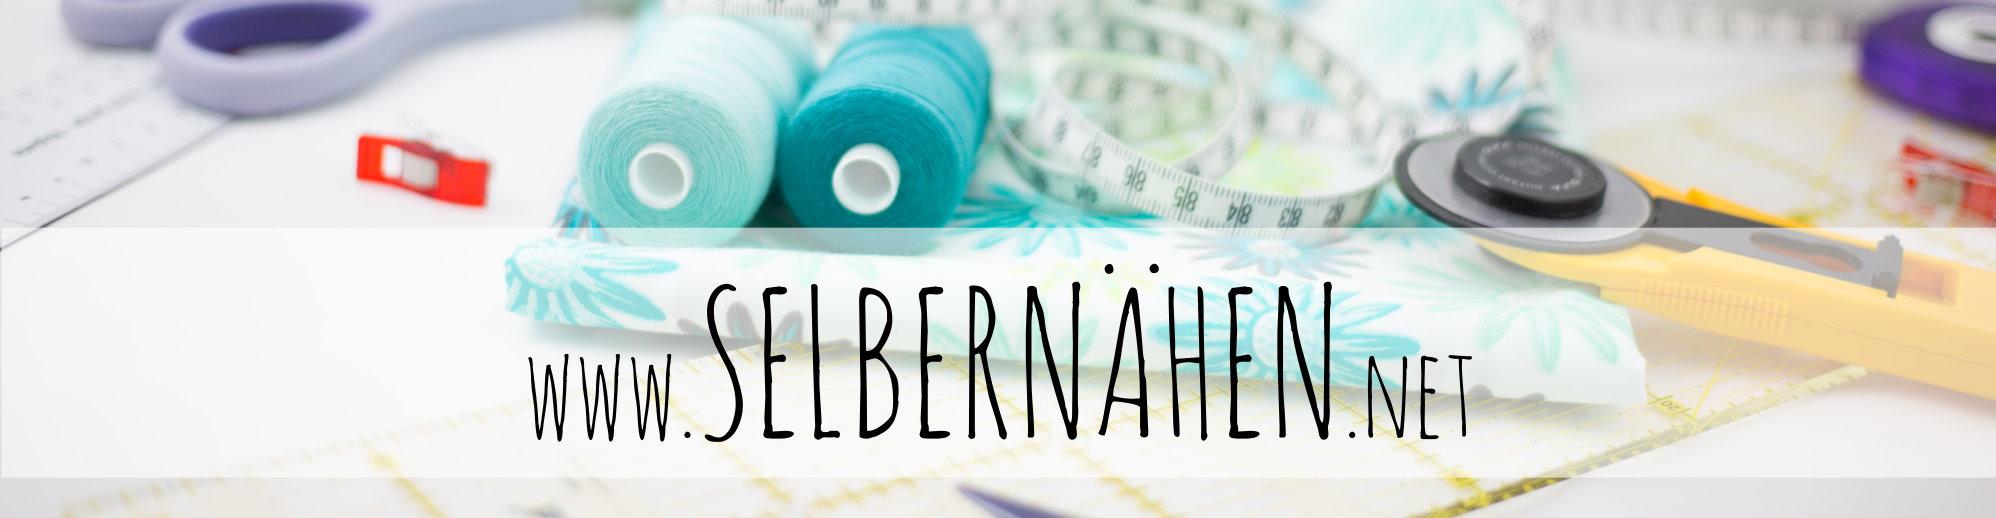 selbernähen.net